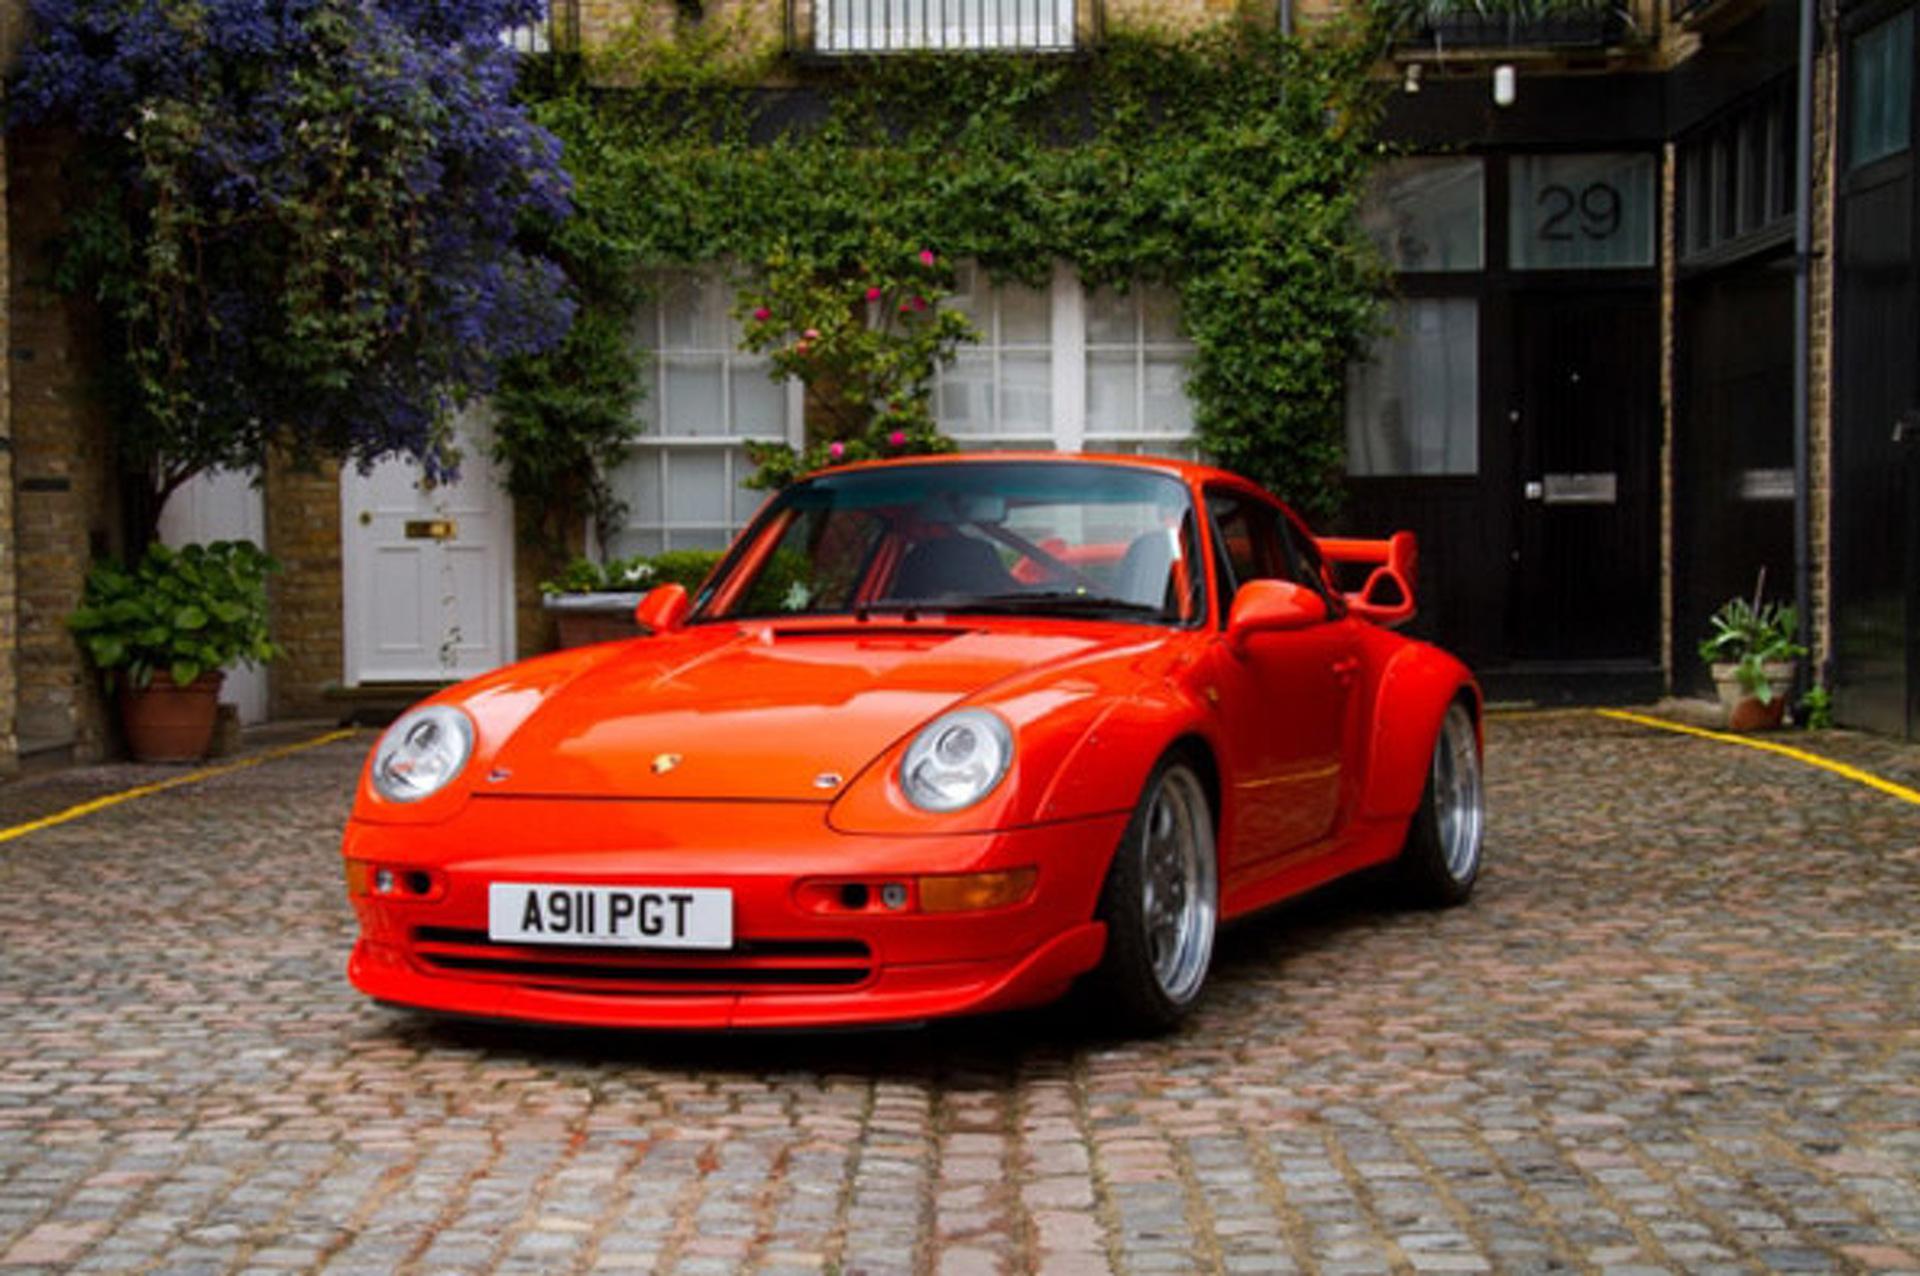 ultra rare porsche 911 gt2 clubsport sold in the uk. Black Bedroom Furniture Sets. Home Design Ideas